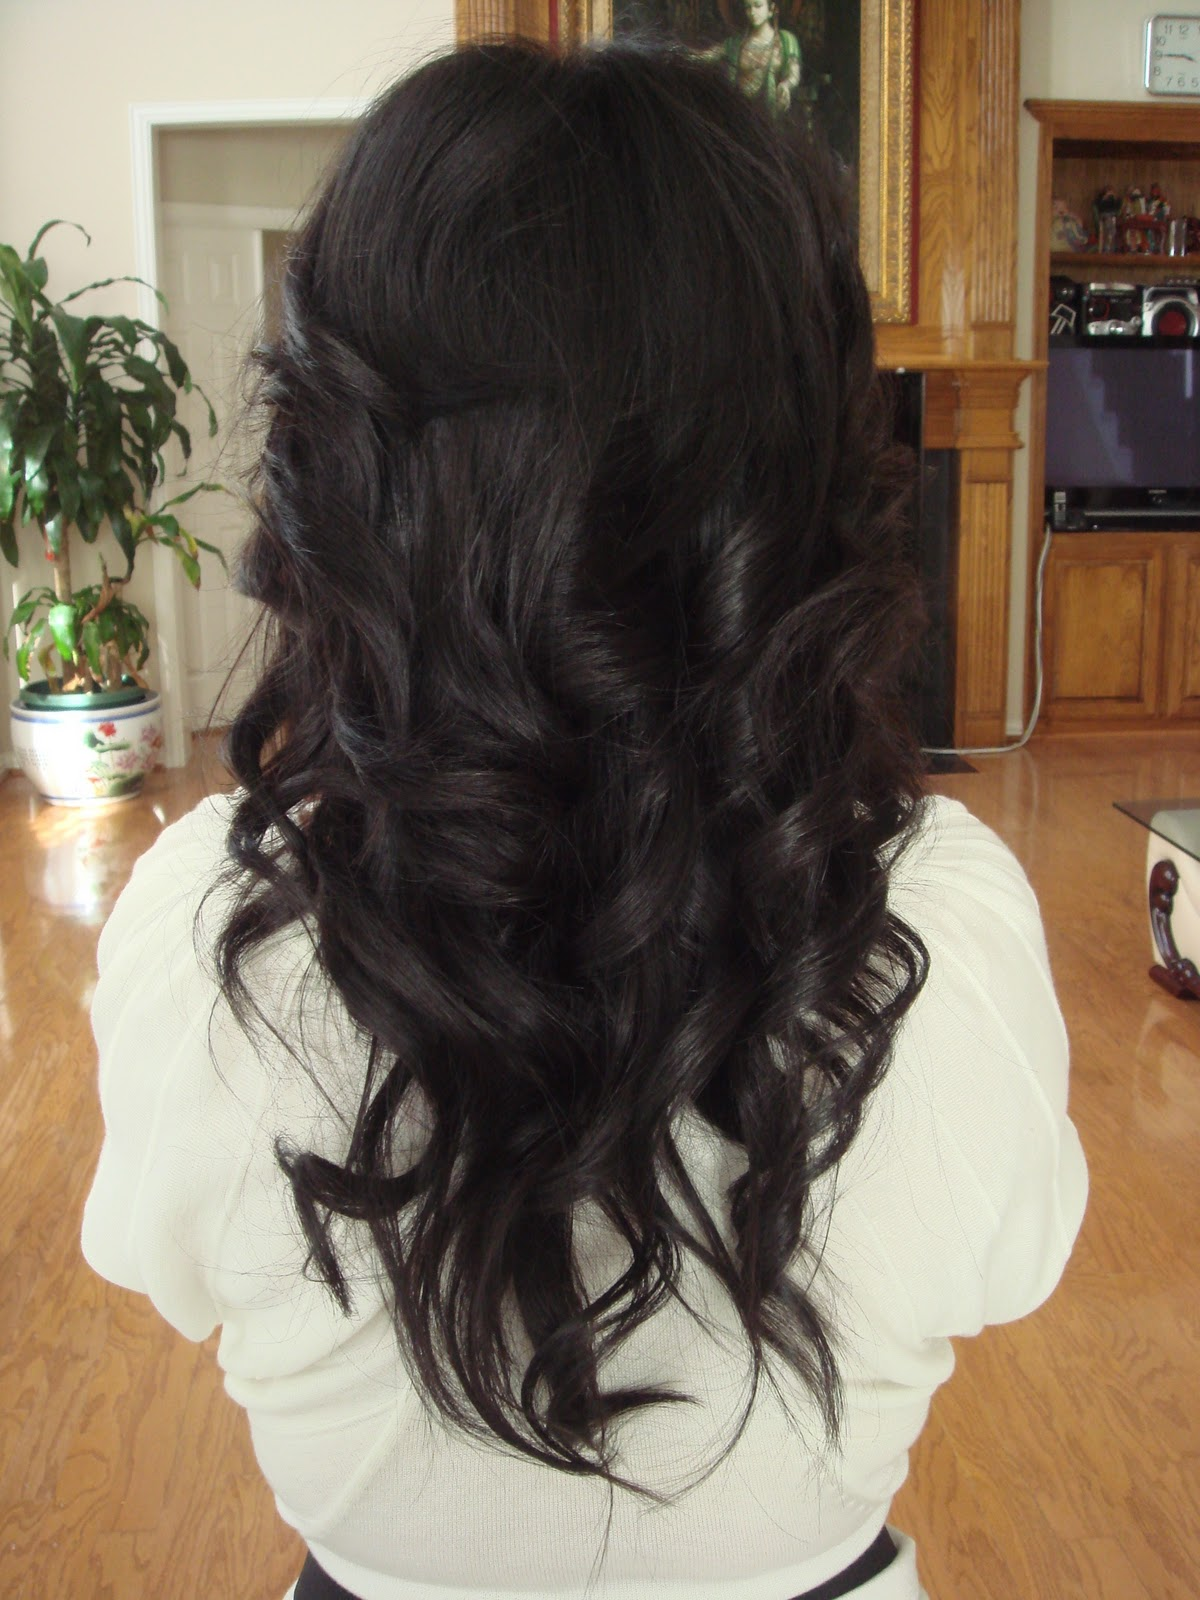 EmJustLikeYou: Curl Hair Using Your Straightener